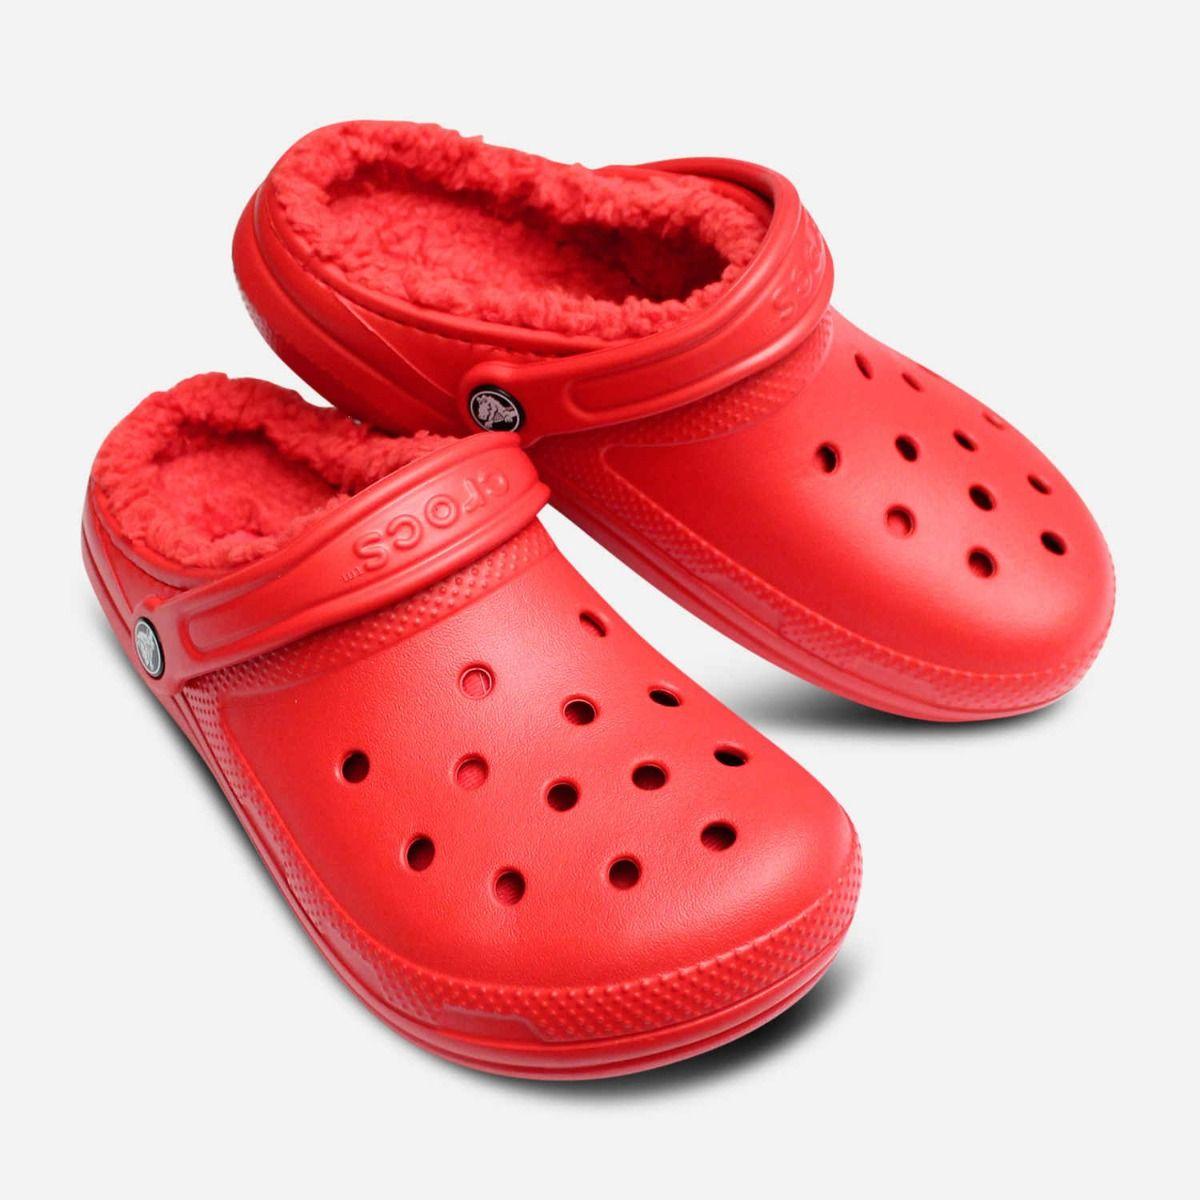 Classic Warm Lined Crocs Clog for Women